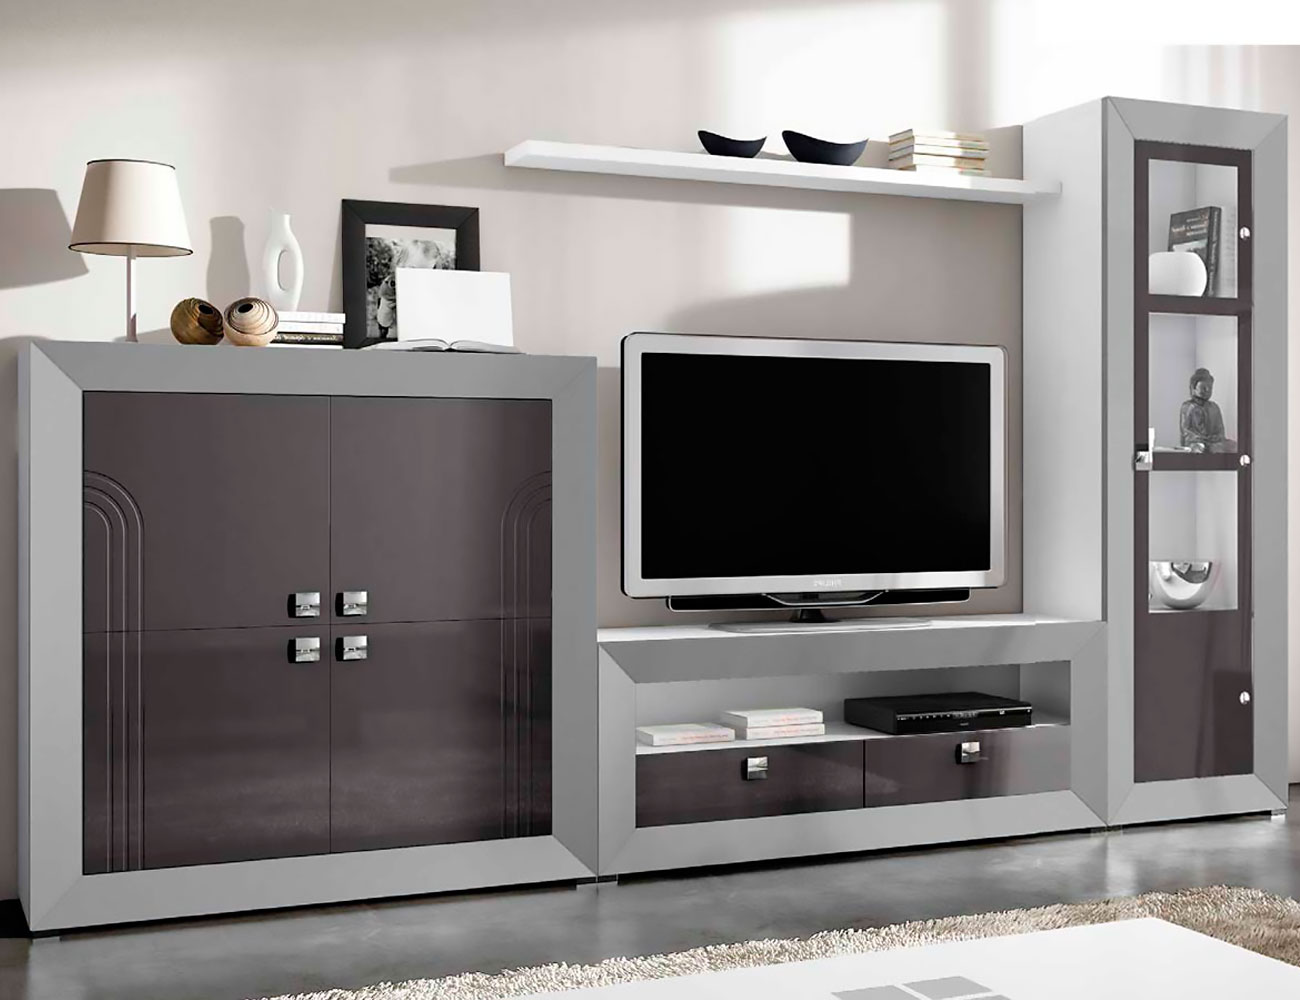 Mueble salon moderno 073